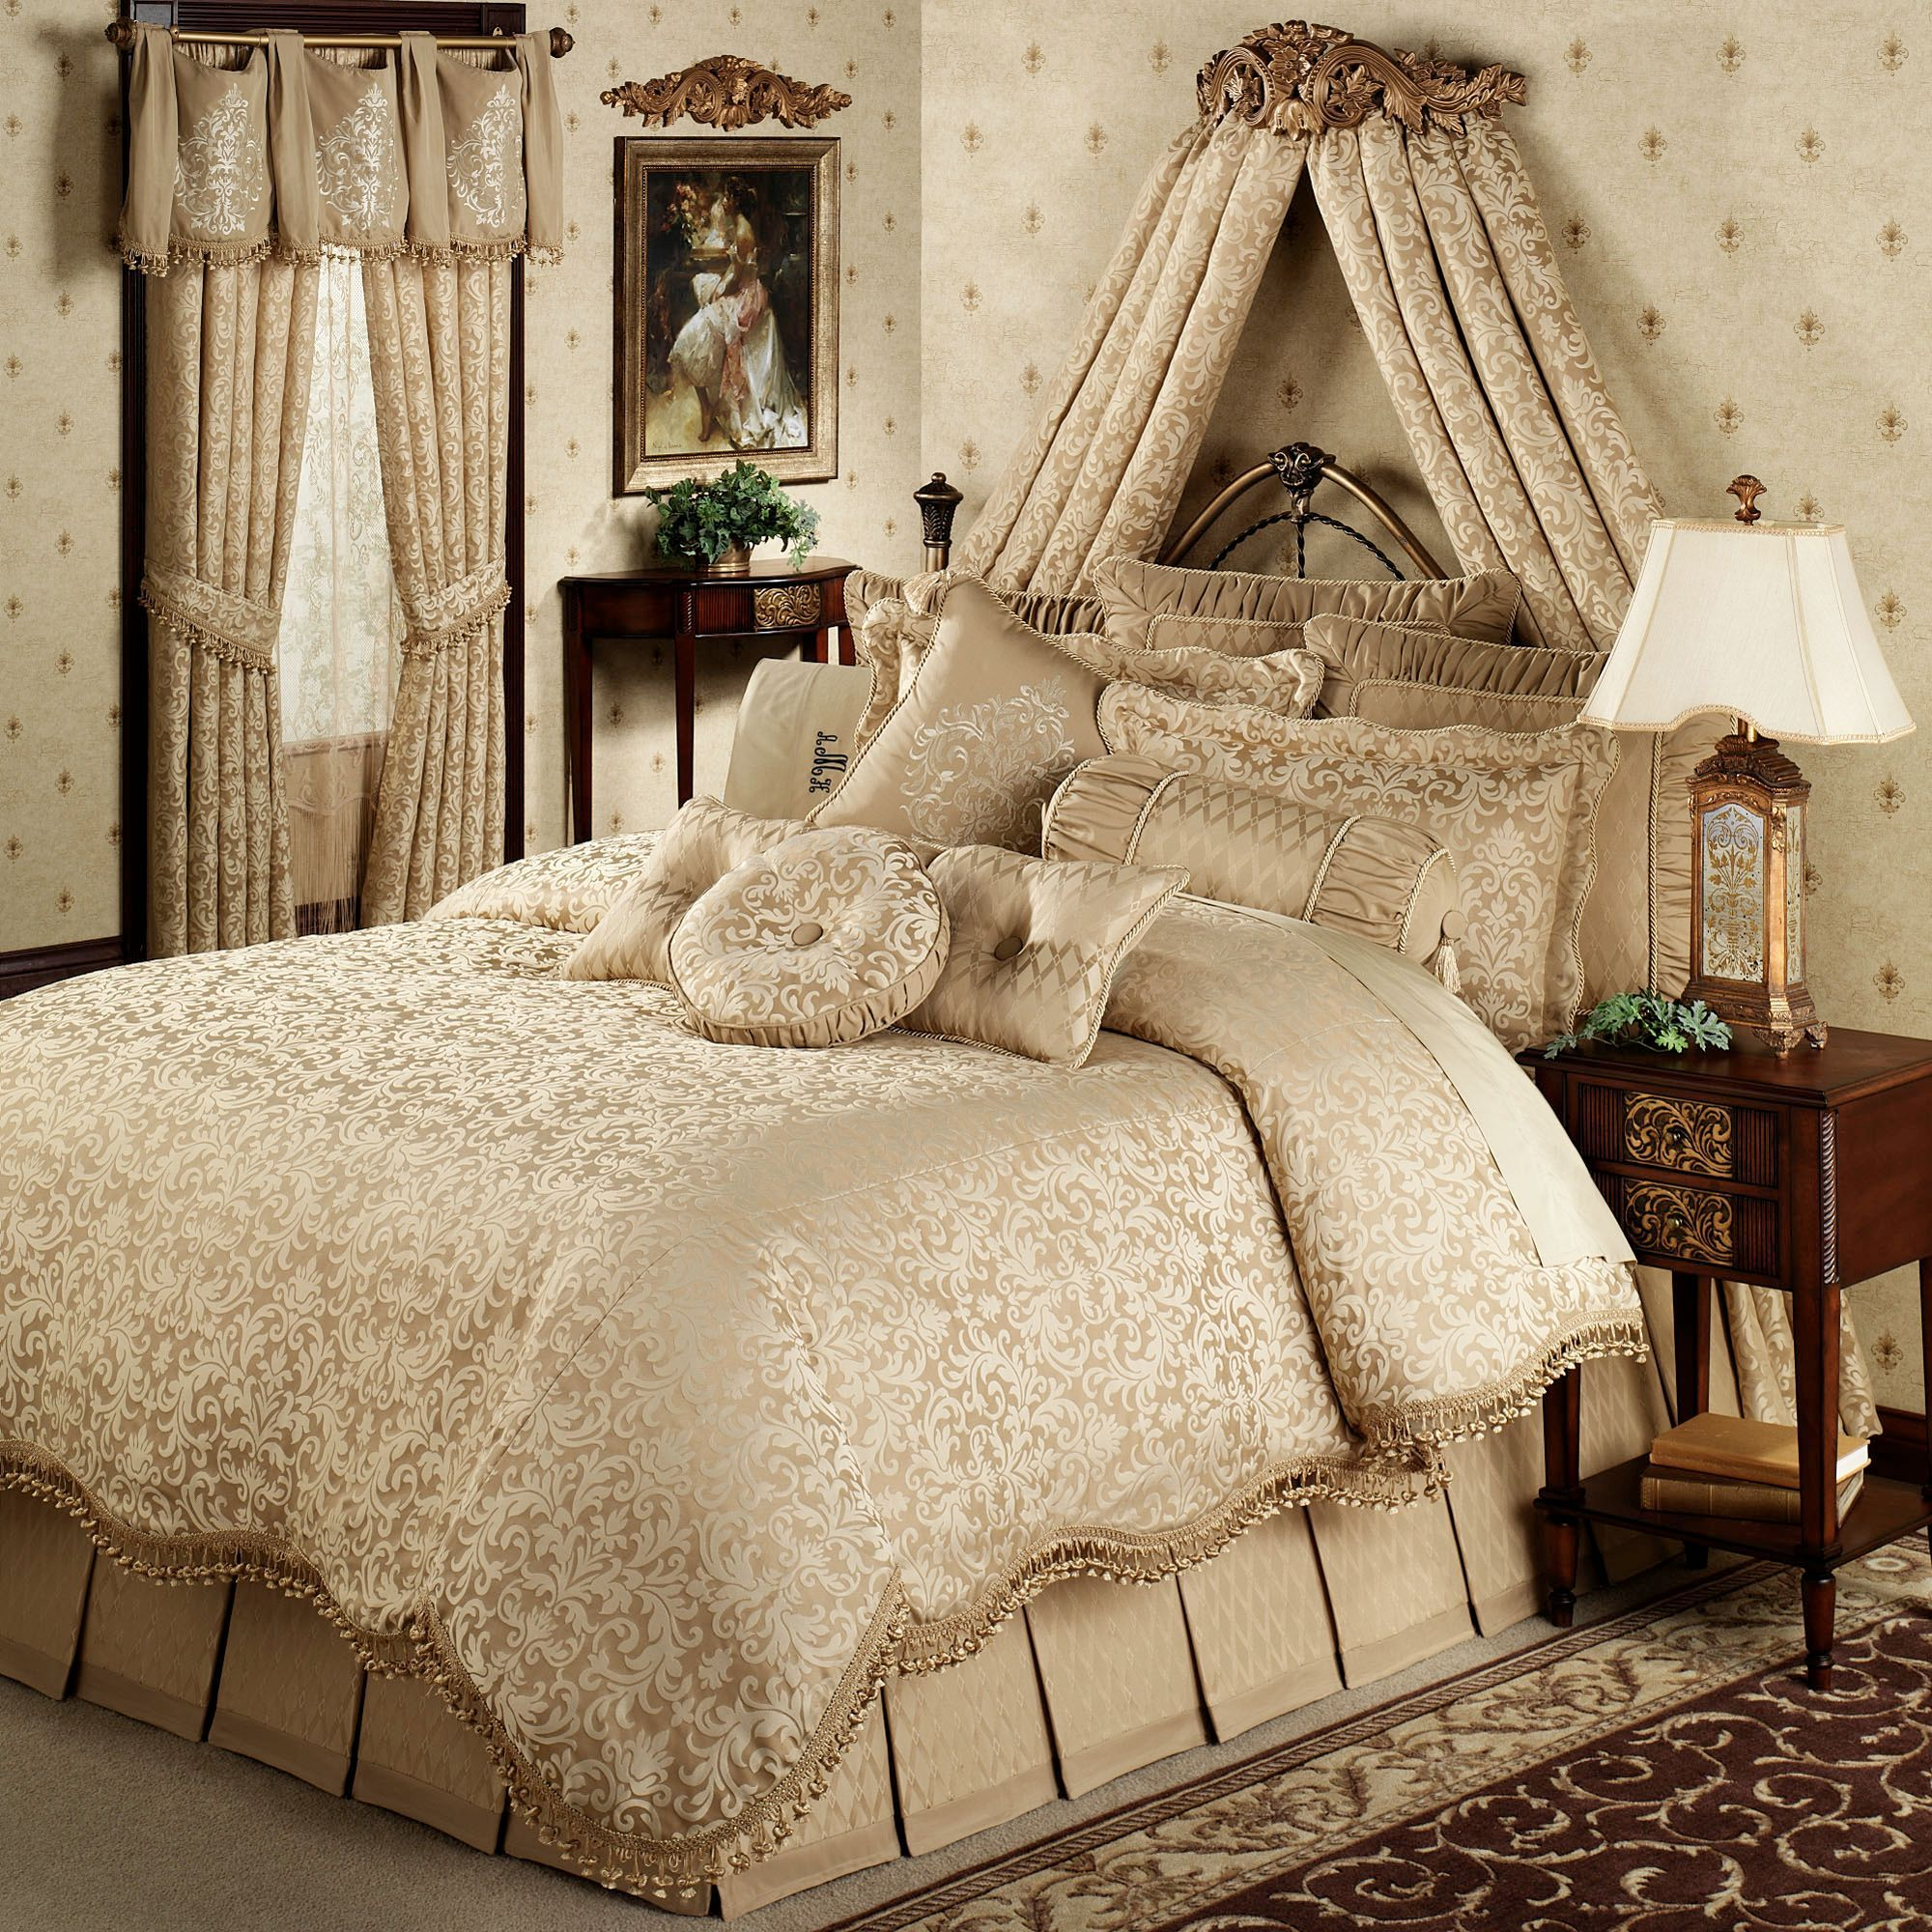 Newcastle Damask Comforter BeddingNewcastle Damask Comforter Bedding  Newcastle Comforter And Damasks